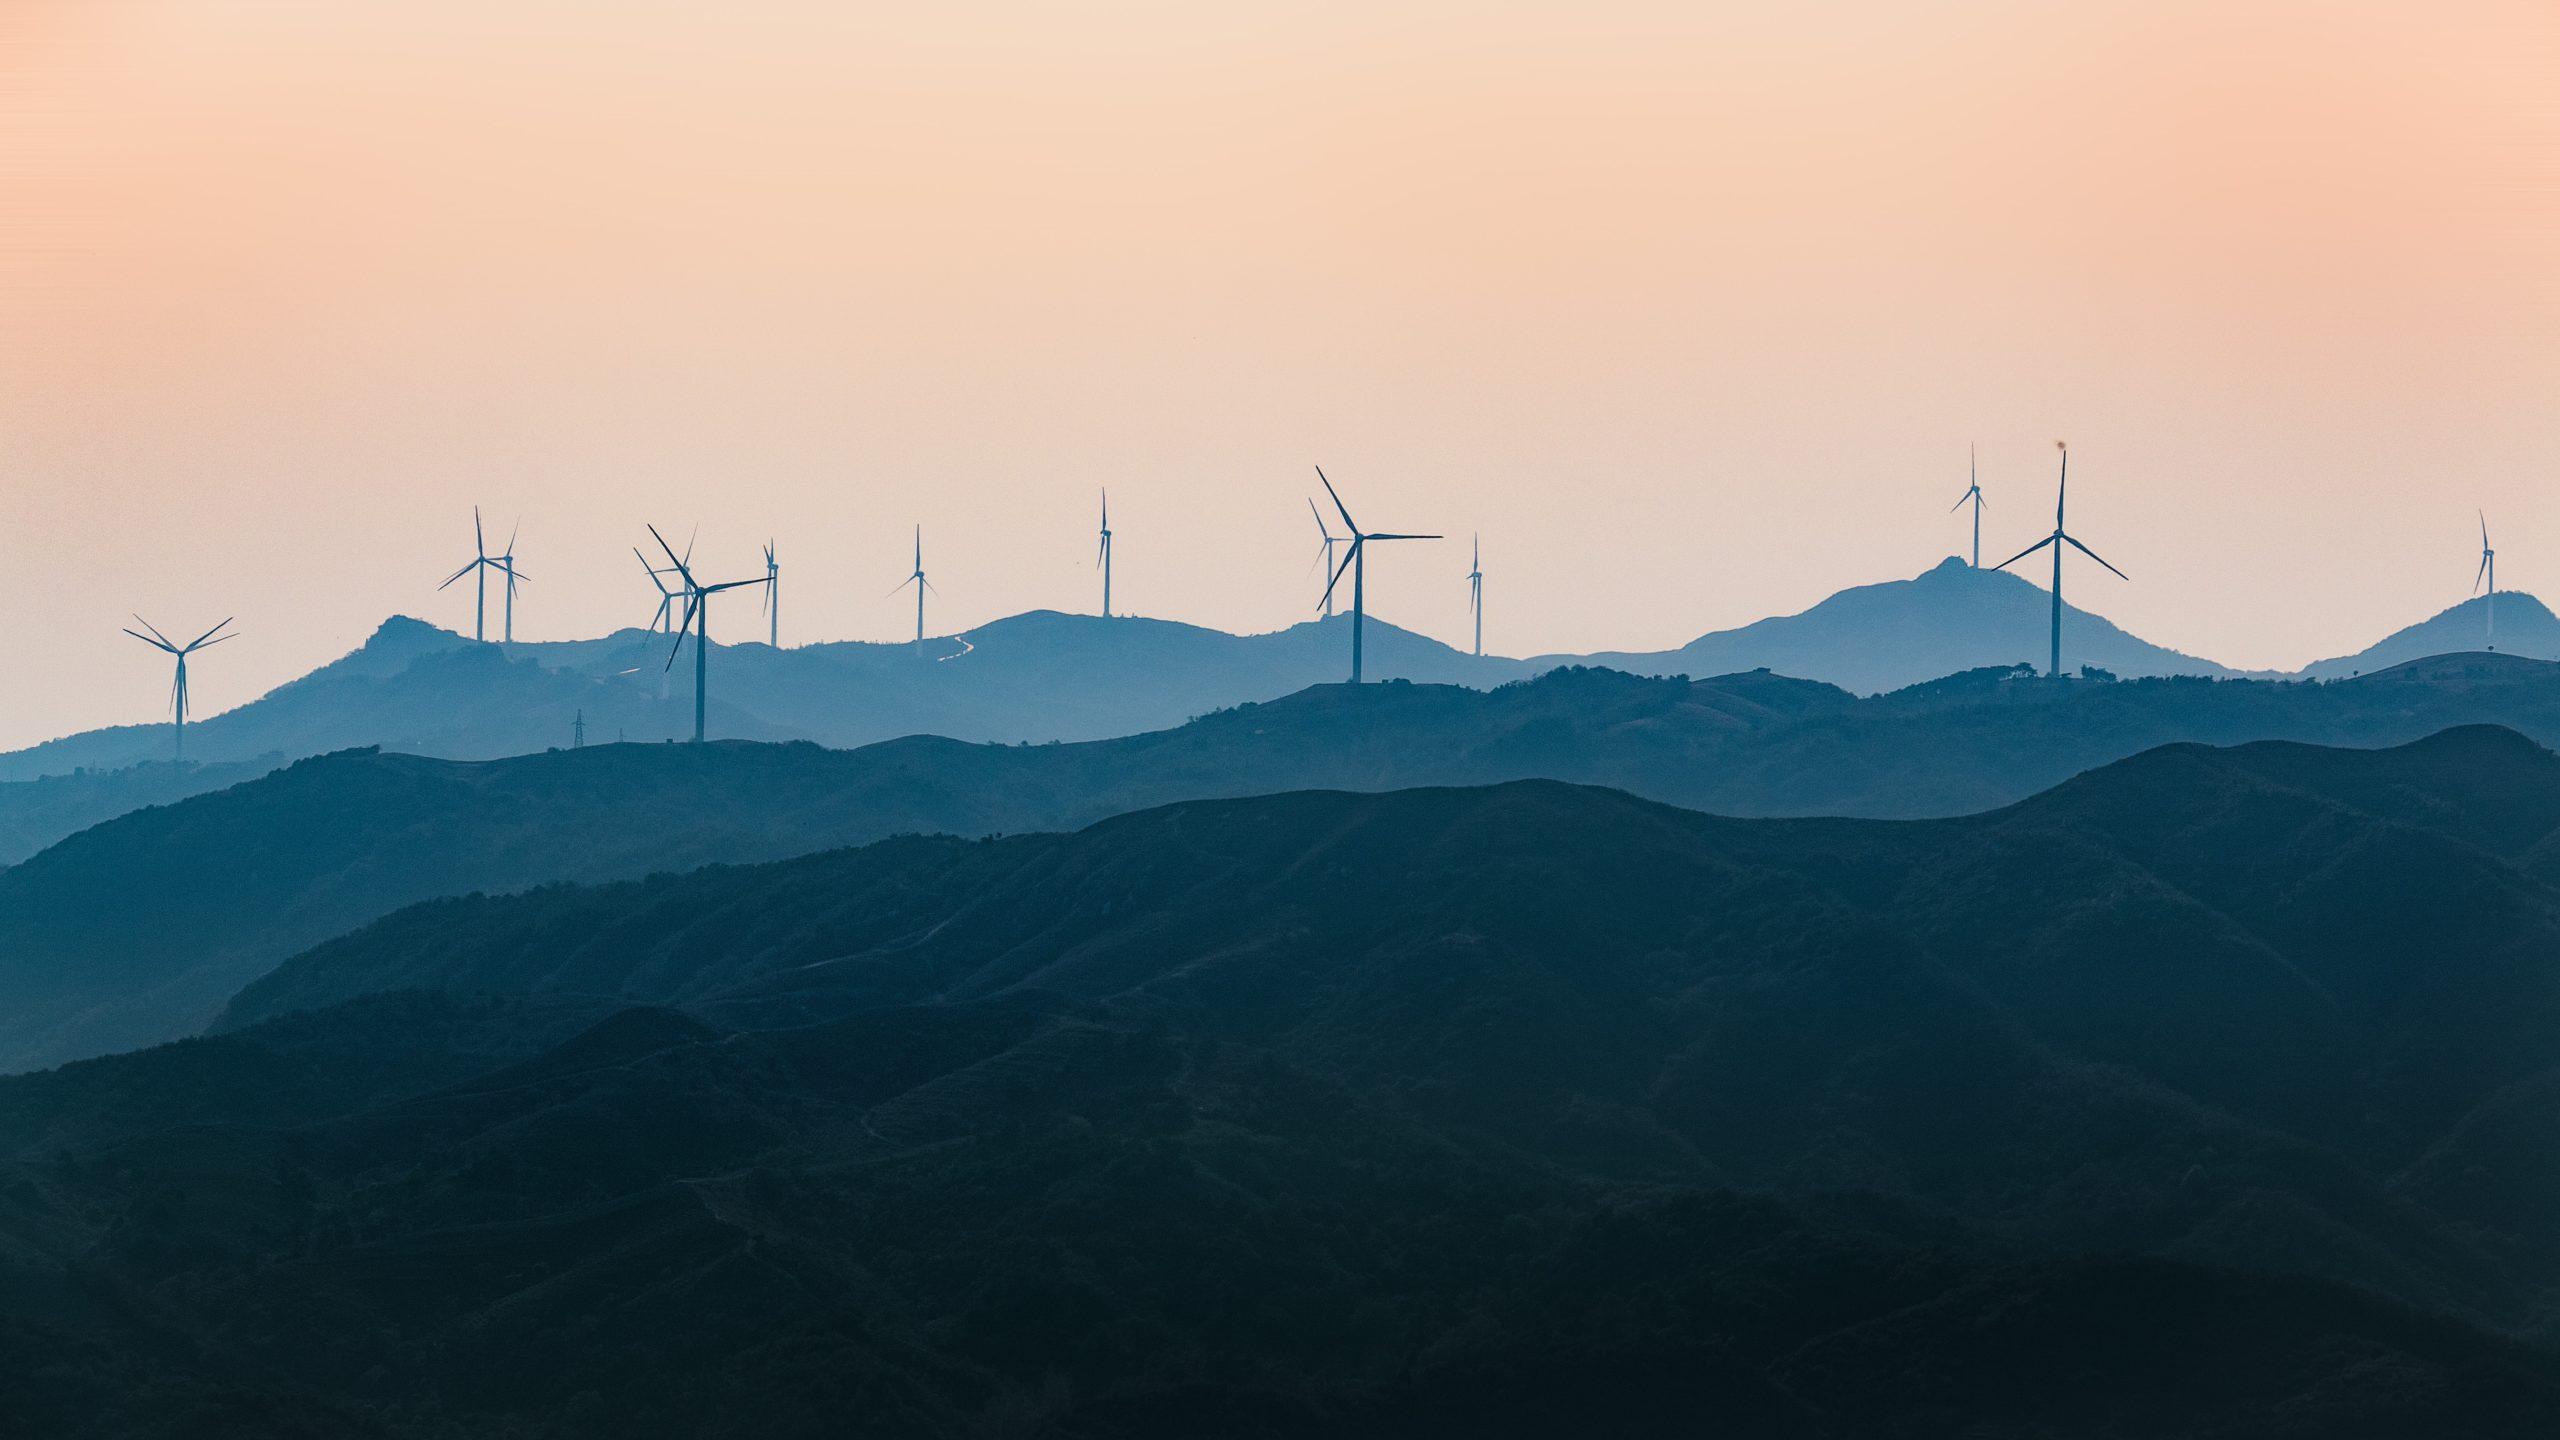 Collaborative multi-level governance for climate resilient development